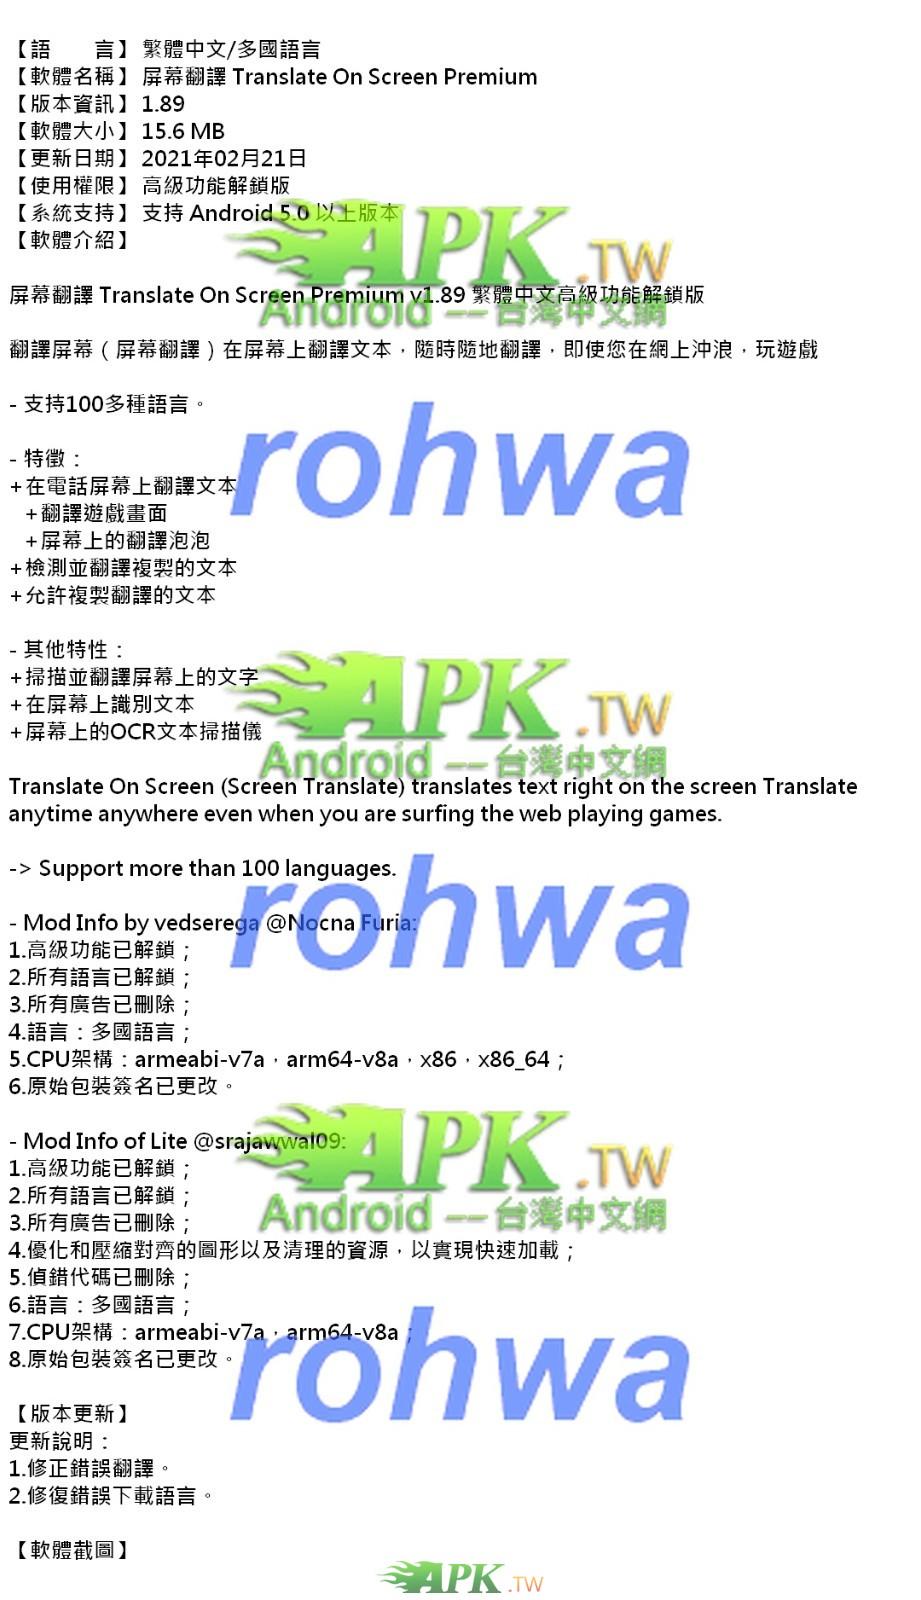 ScreenTranslate_Premium_1.89_.jpg